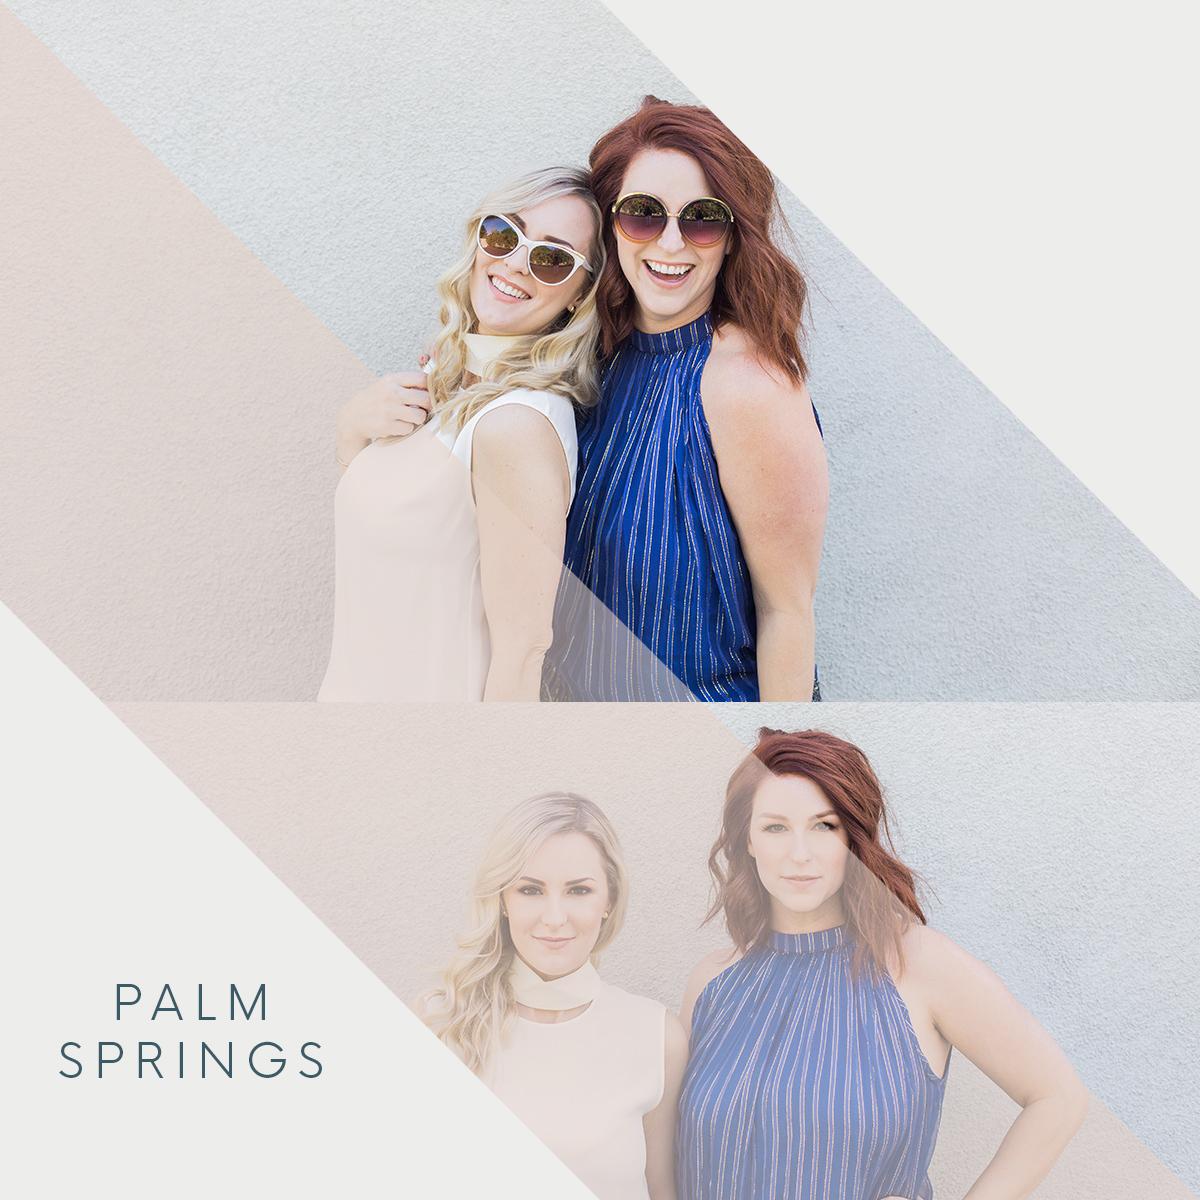 gallery_Palm_Springs_brand_camp.jpg